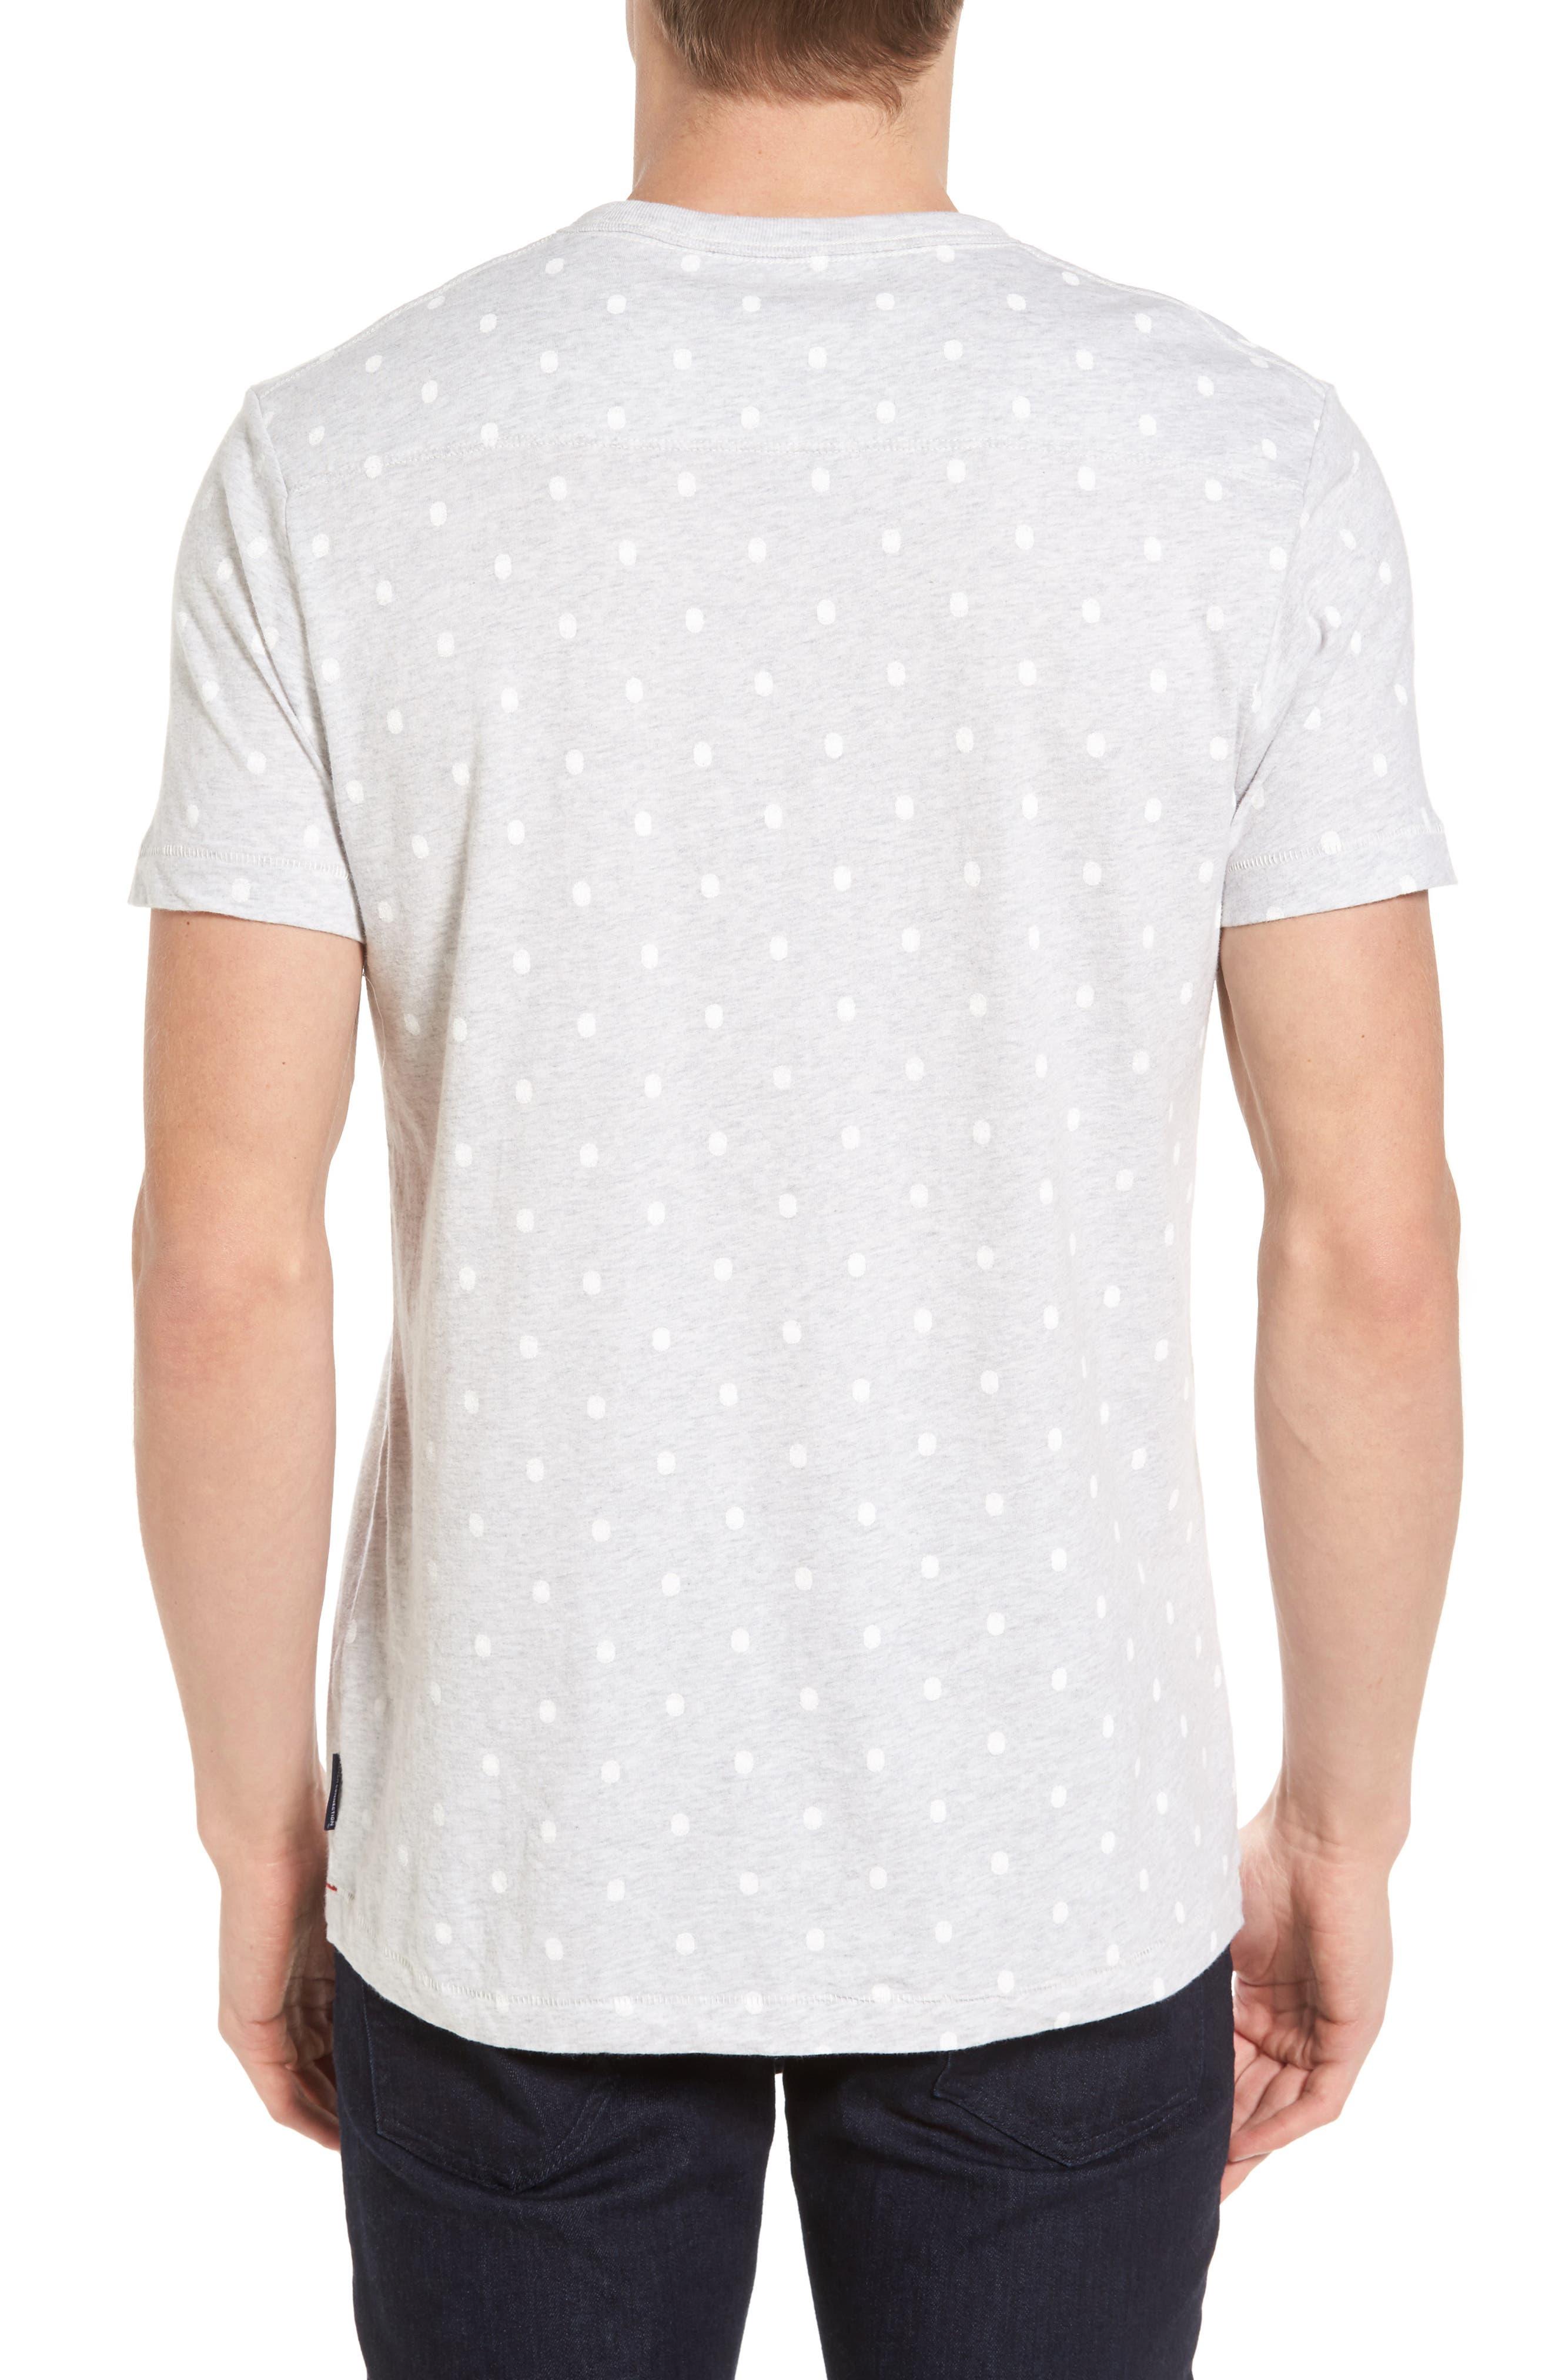 Polka Dot T-Shirt,                             Alternate thumbnail 2, color,                             020